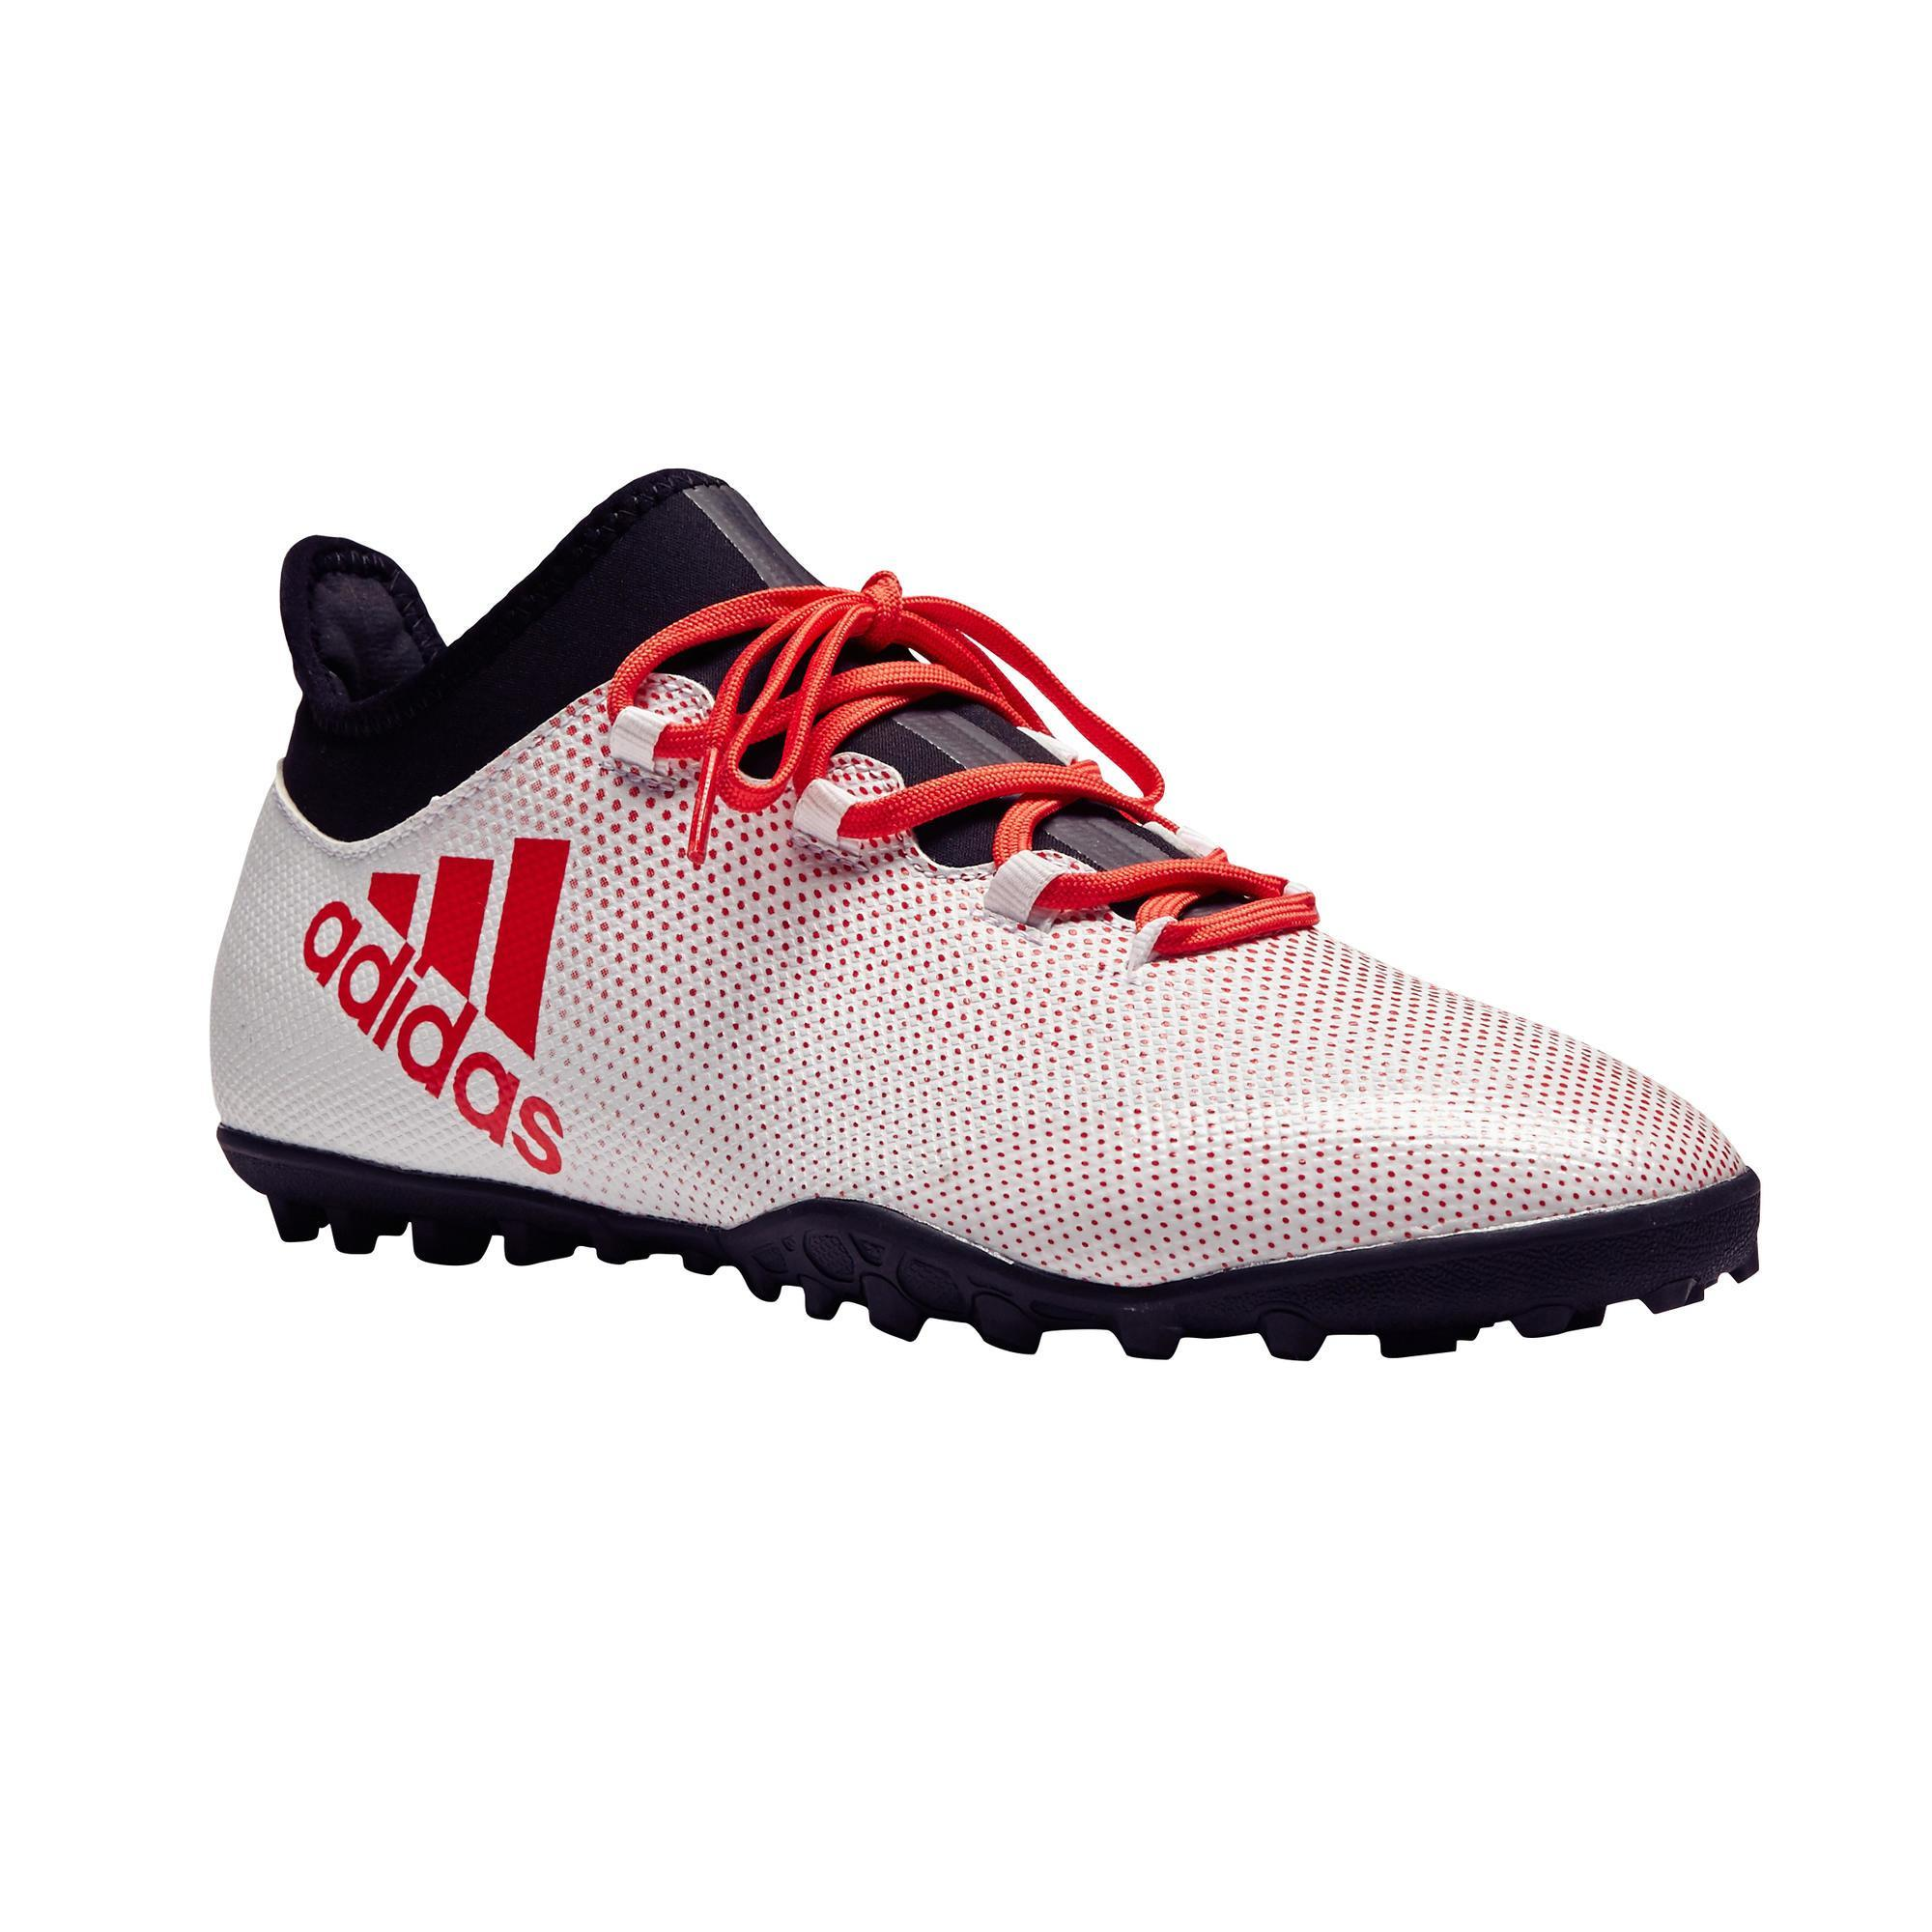 authentic sleek high fashion Fg Blanche Enfant 17 Chaussure 3 Football Decathlon Adulte De X Adidas  qw071Tz-evaluate.gitelilas.fr